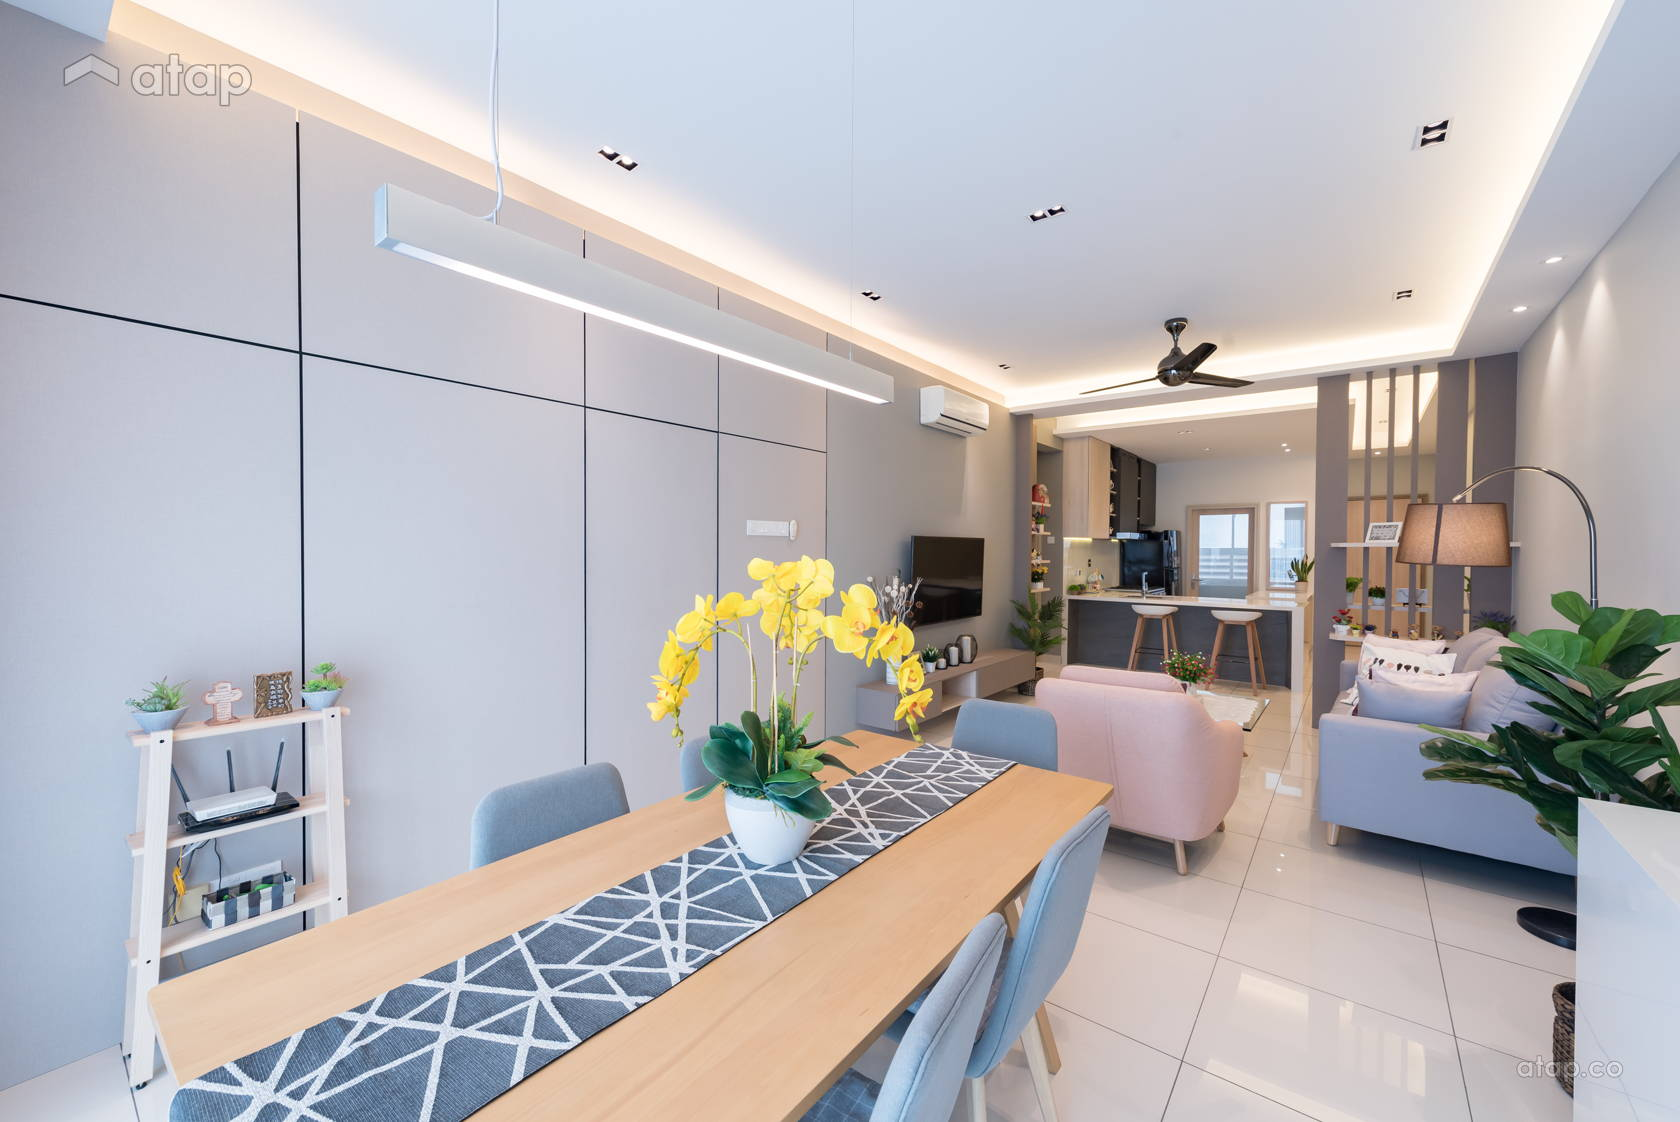 Minimalistic Scandinavian Kitchen Living Room Condominium Design Ideas Photos Malaysia Atap Co